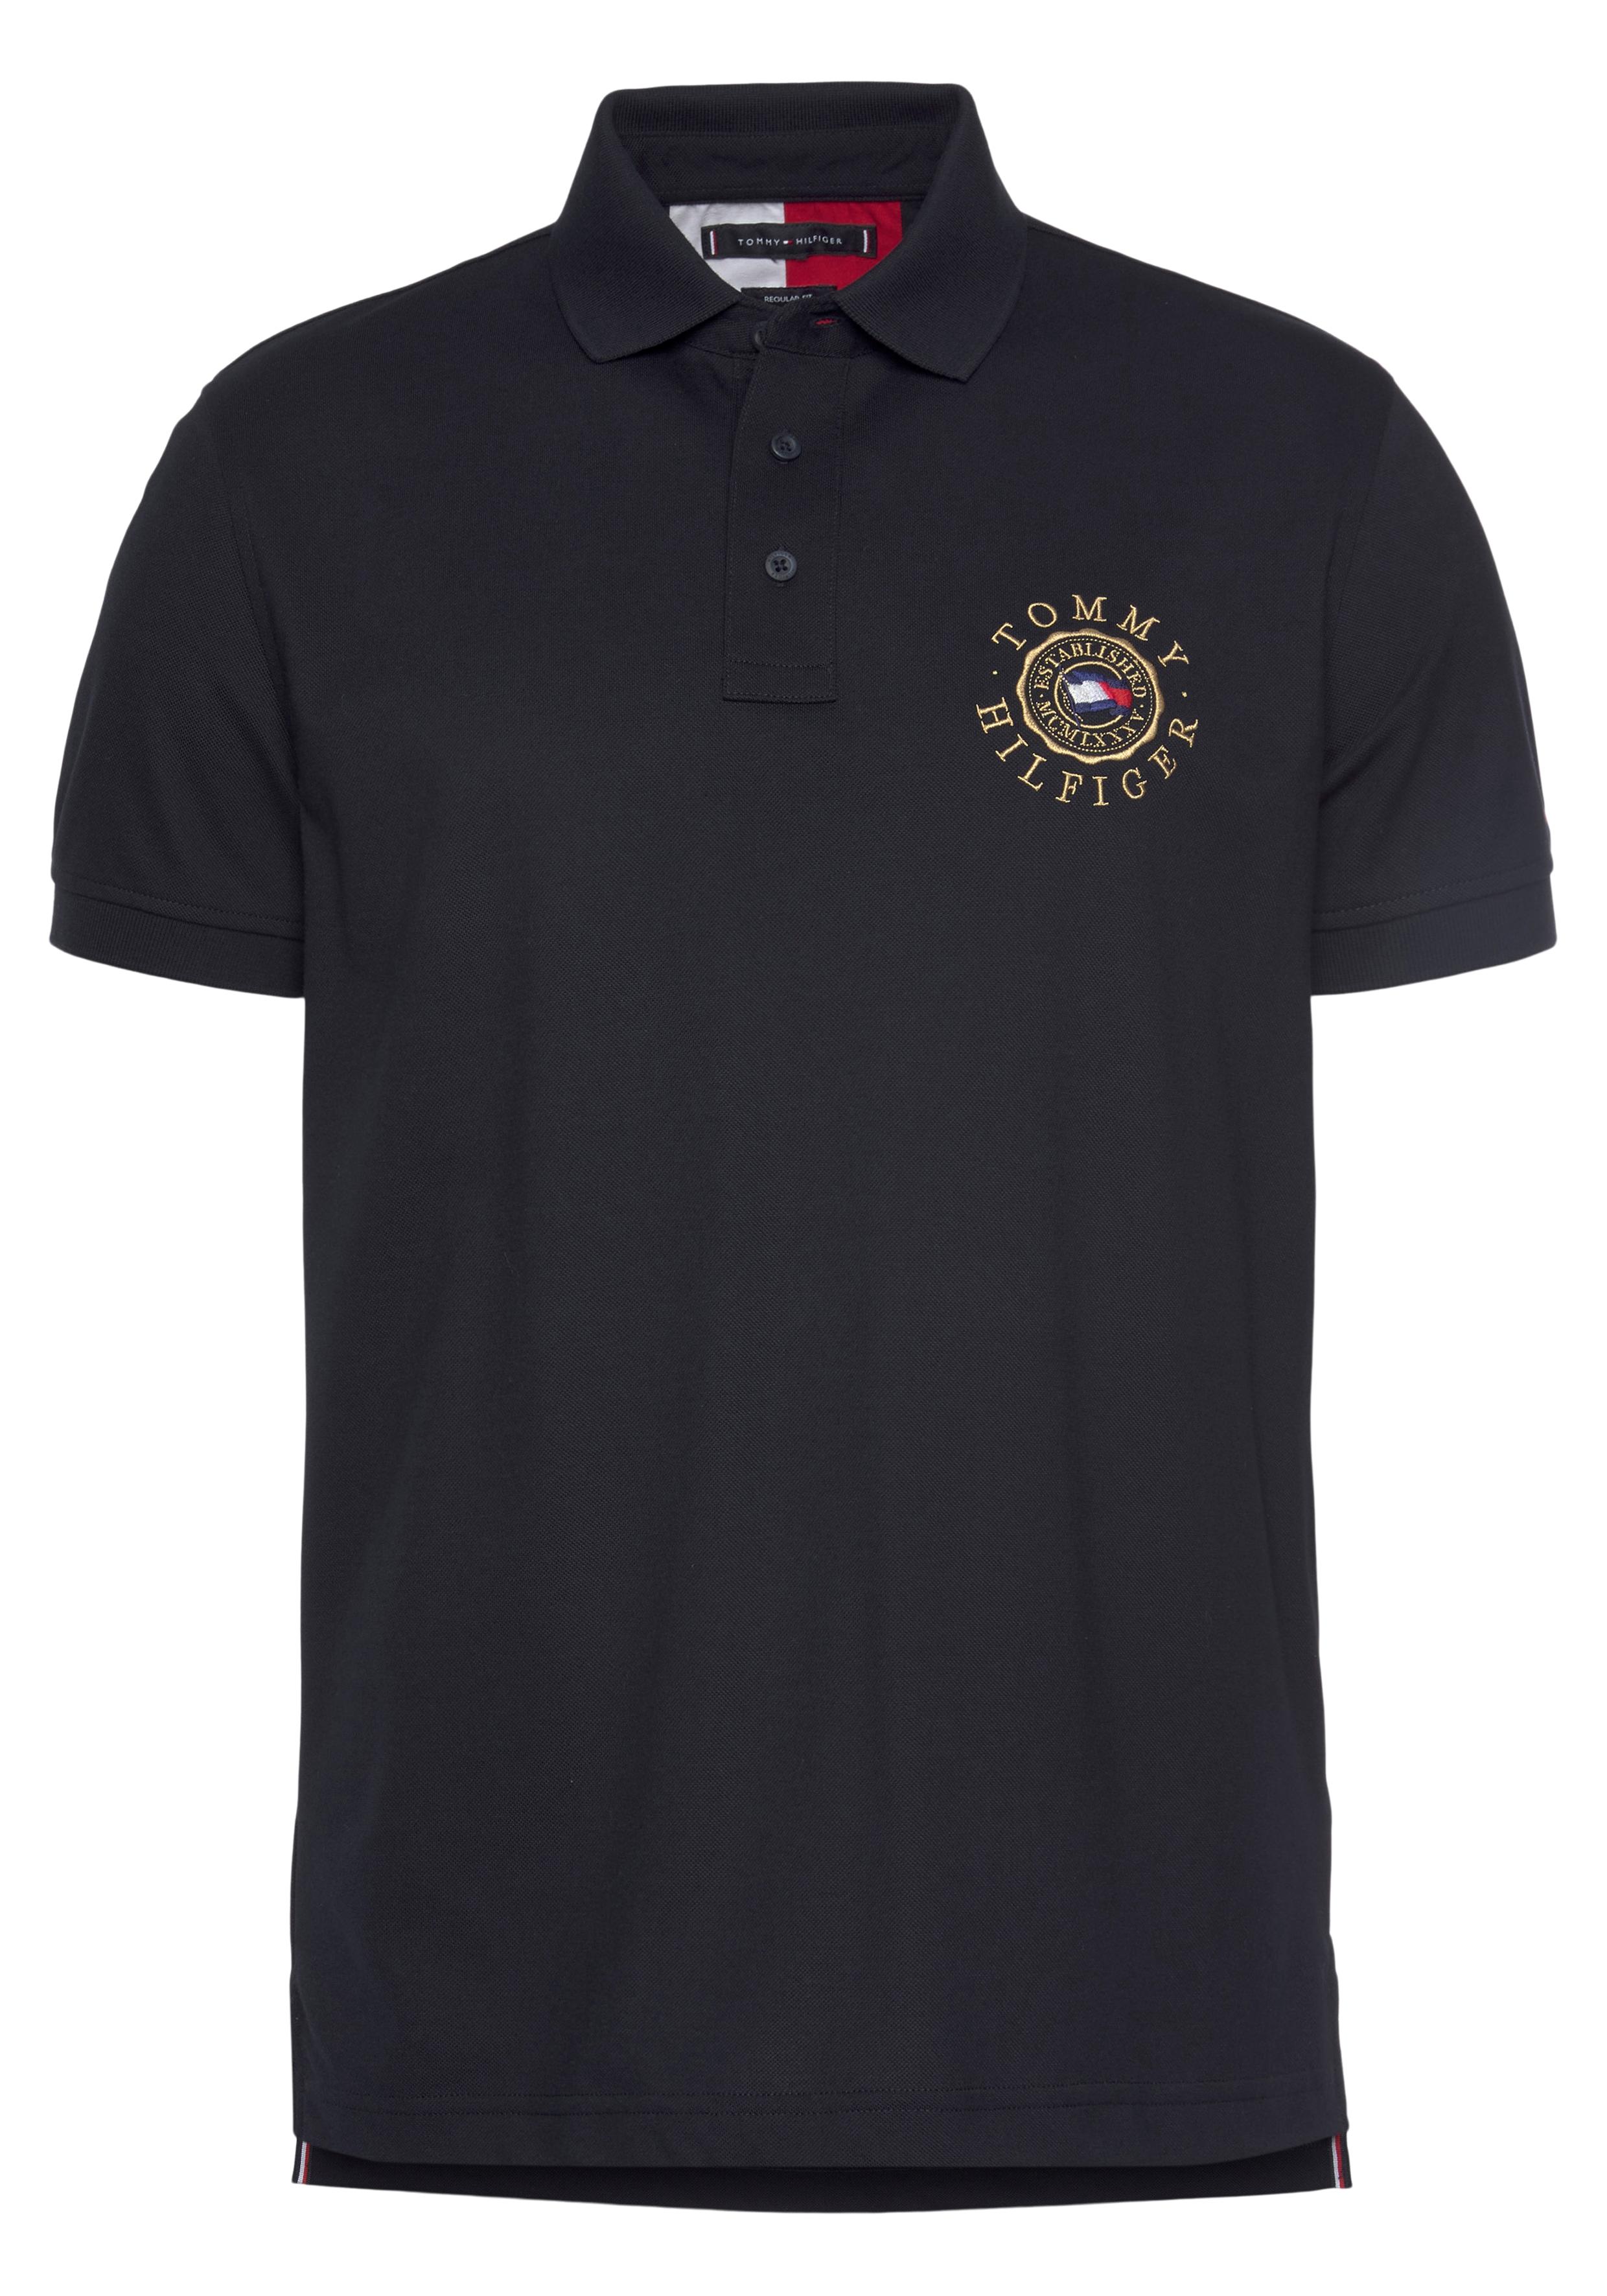 tommy hilfiger -  Poloshirt ICON ROUNDAL REGULAR POLO